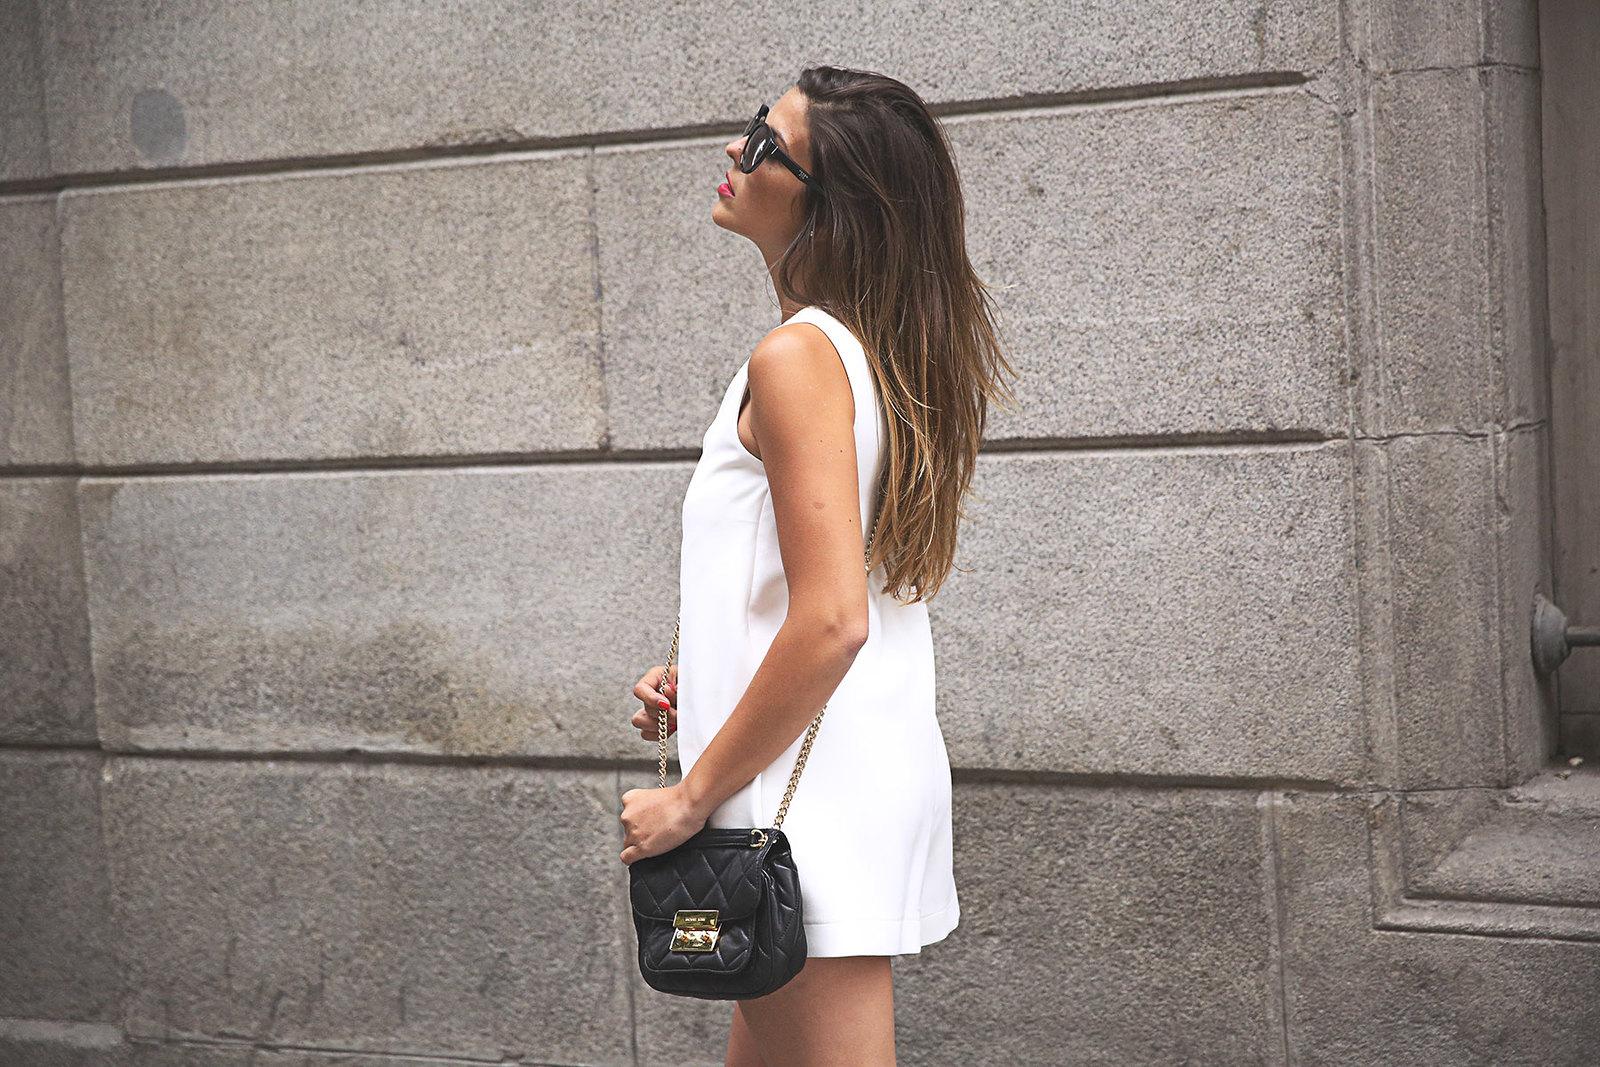 trendy-taste-look-outfit-street-style-ootd-blog-blogger-fashion-spain-moda-españa-steve-madden-mono-overall-playsuit-sandalias-michael-kors-white-blanco-7